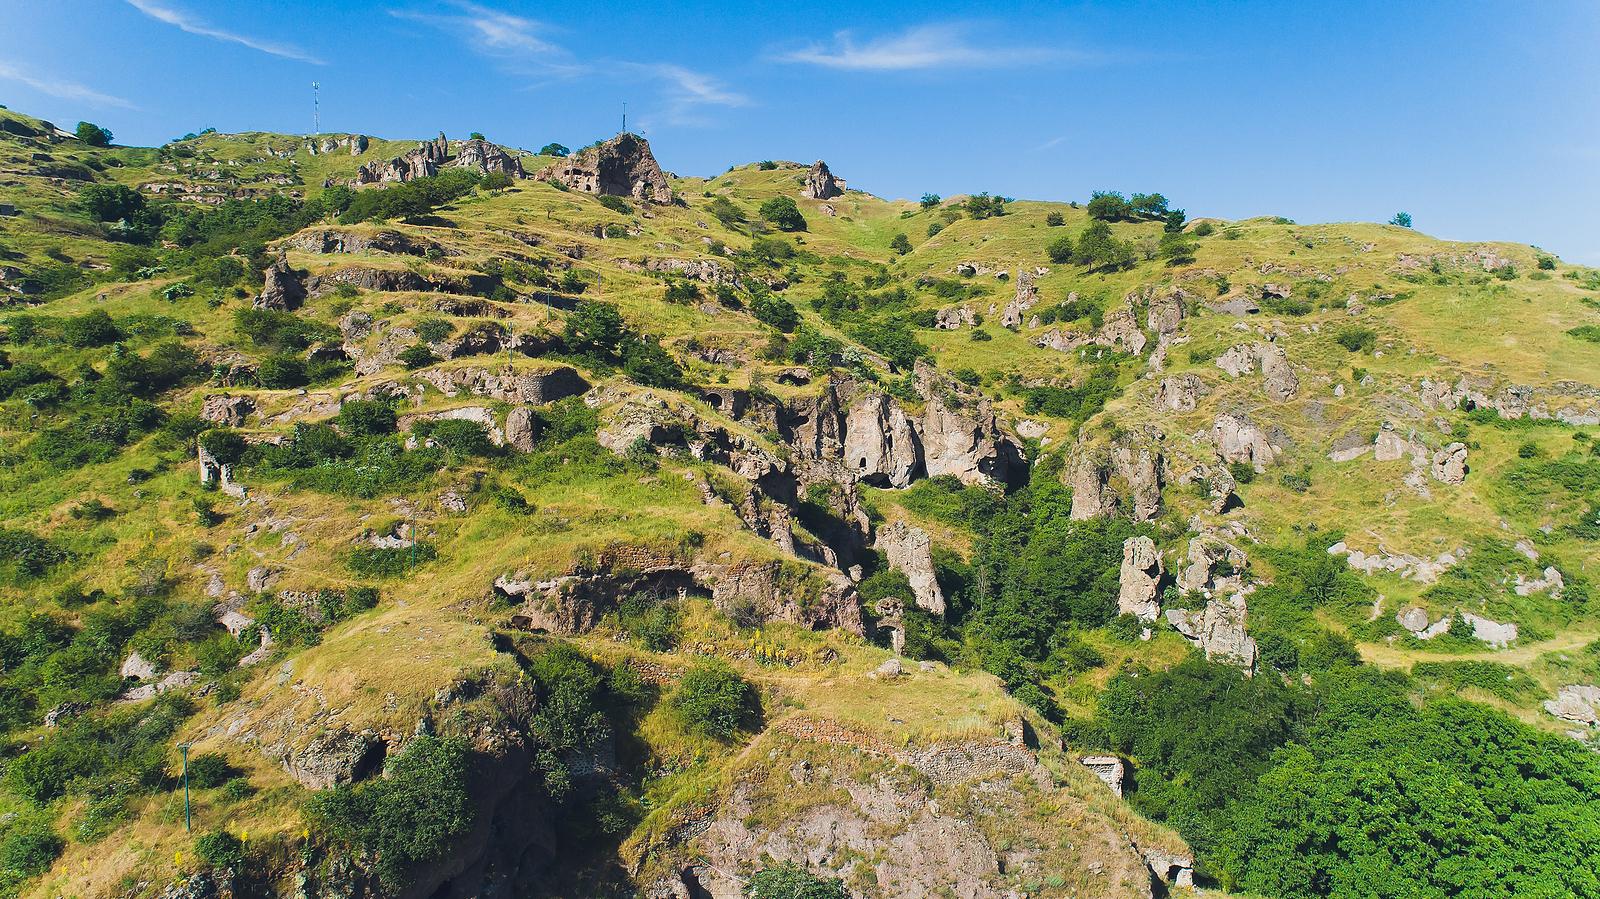 Ancient caves at Khndzoresk